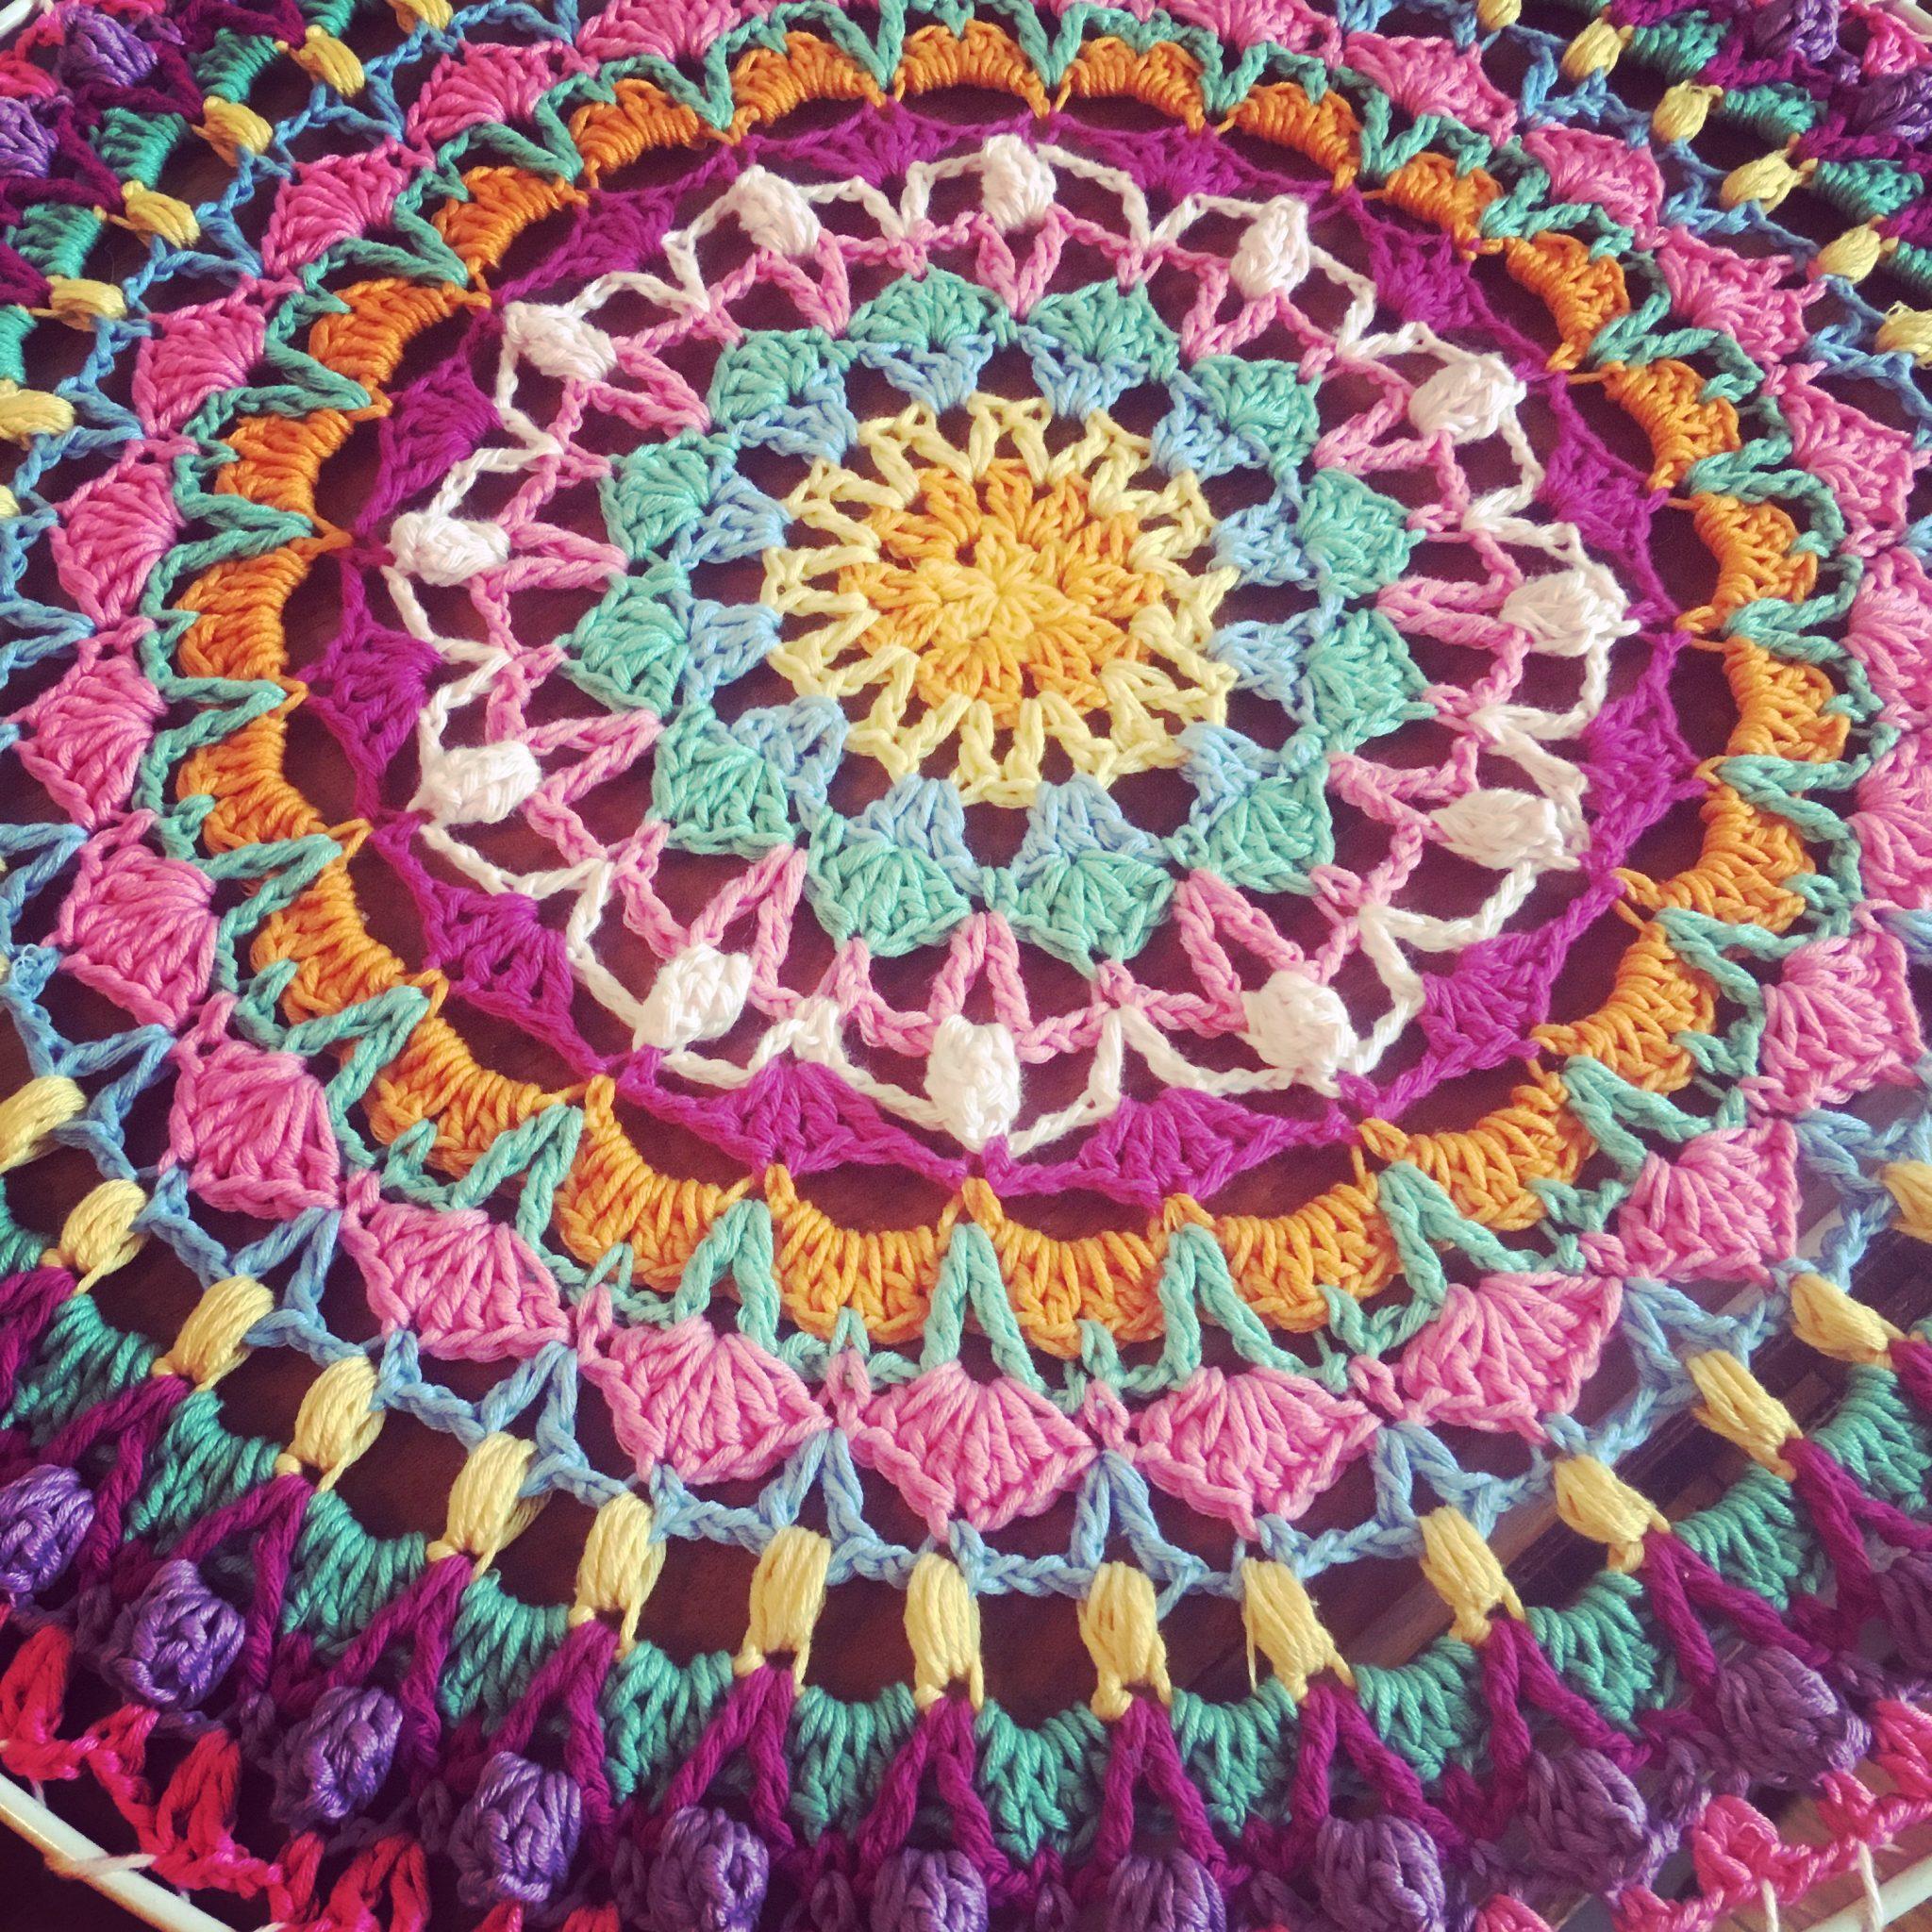 Crochet Along Mandala (Project CALM)